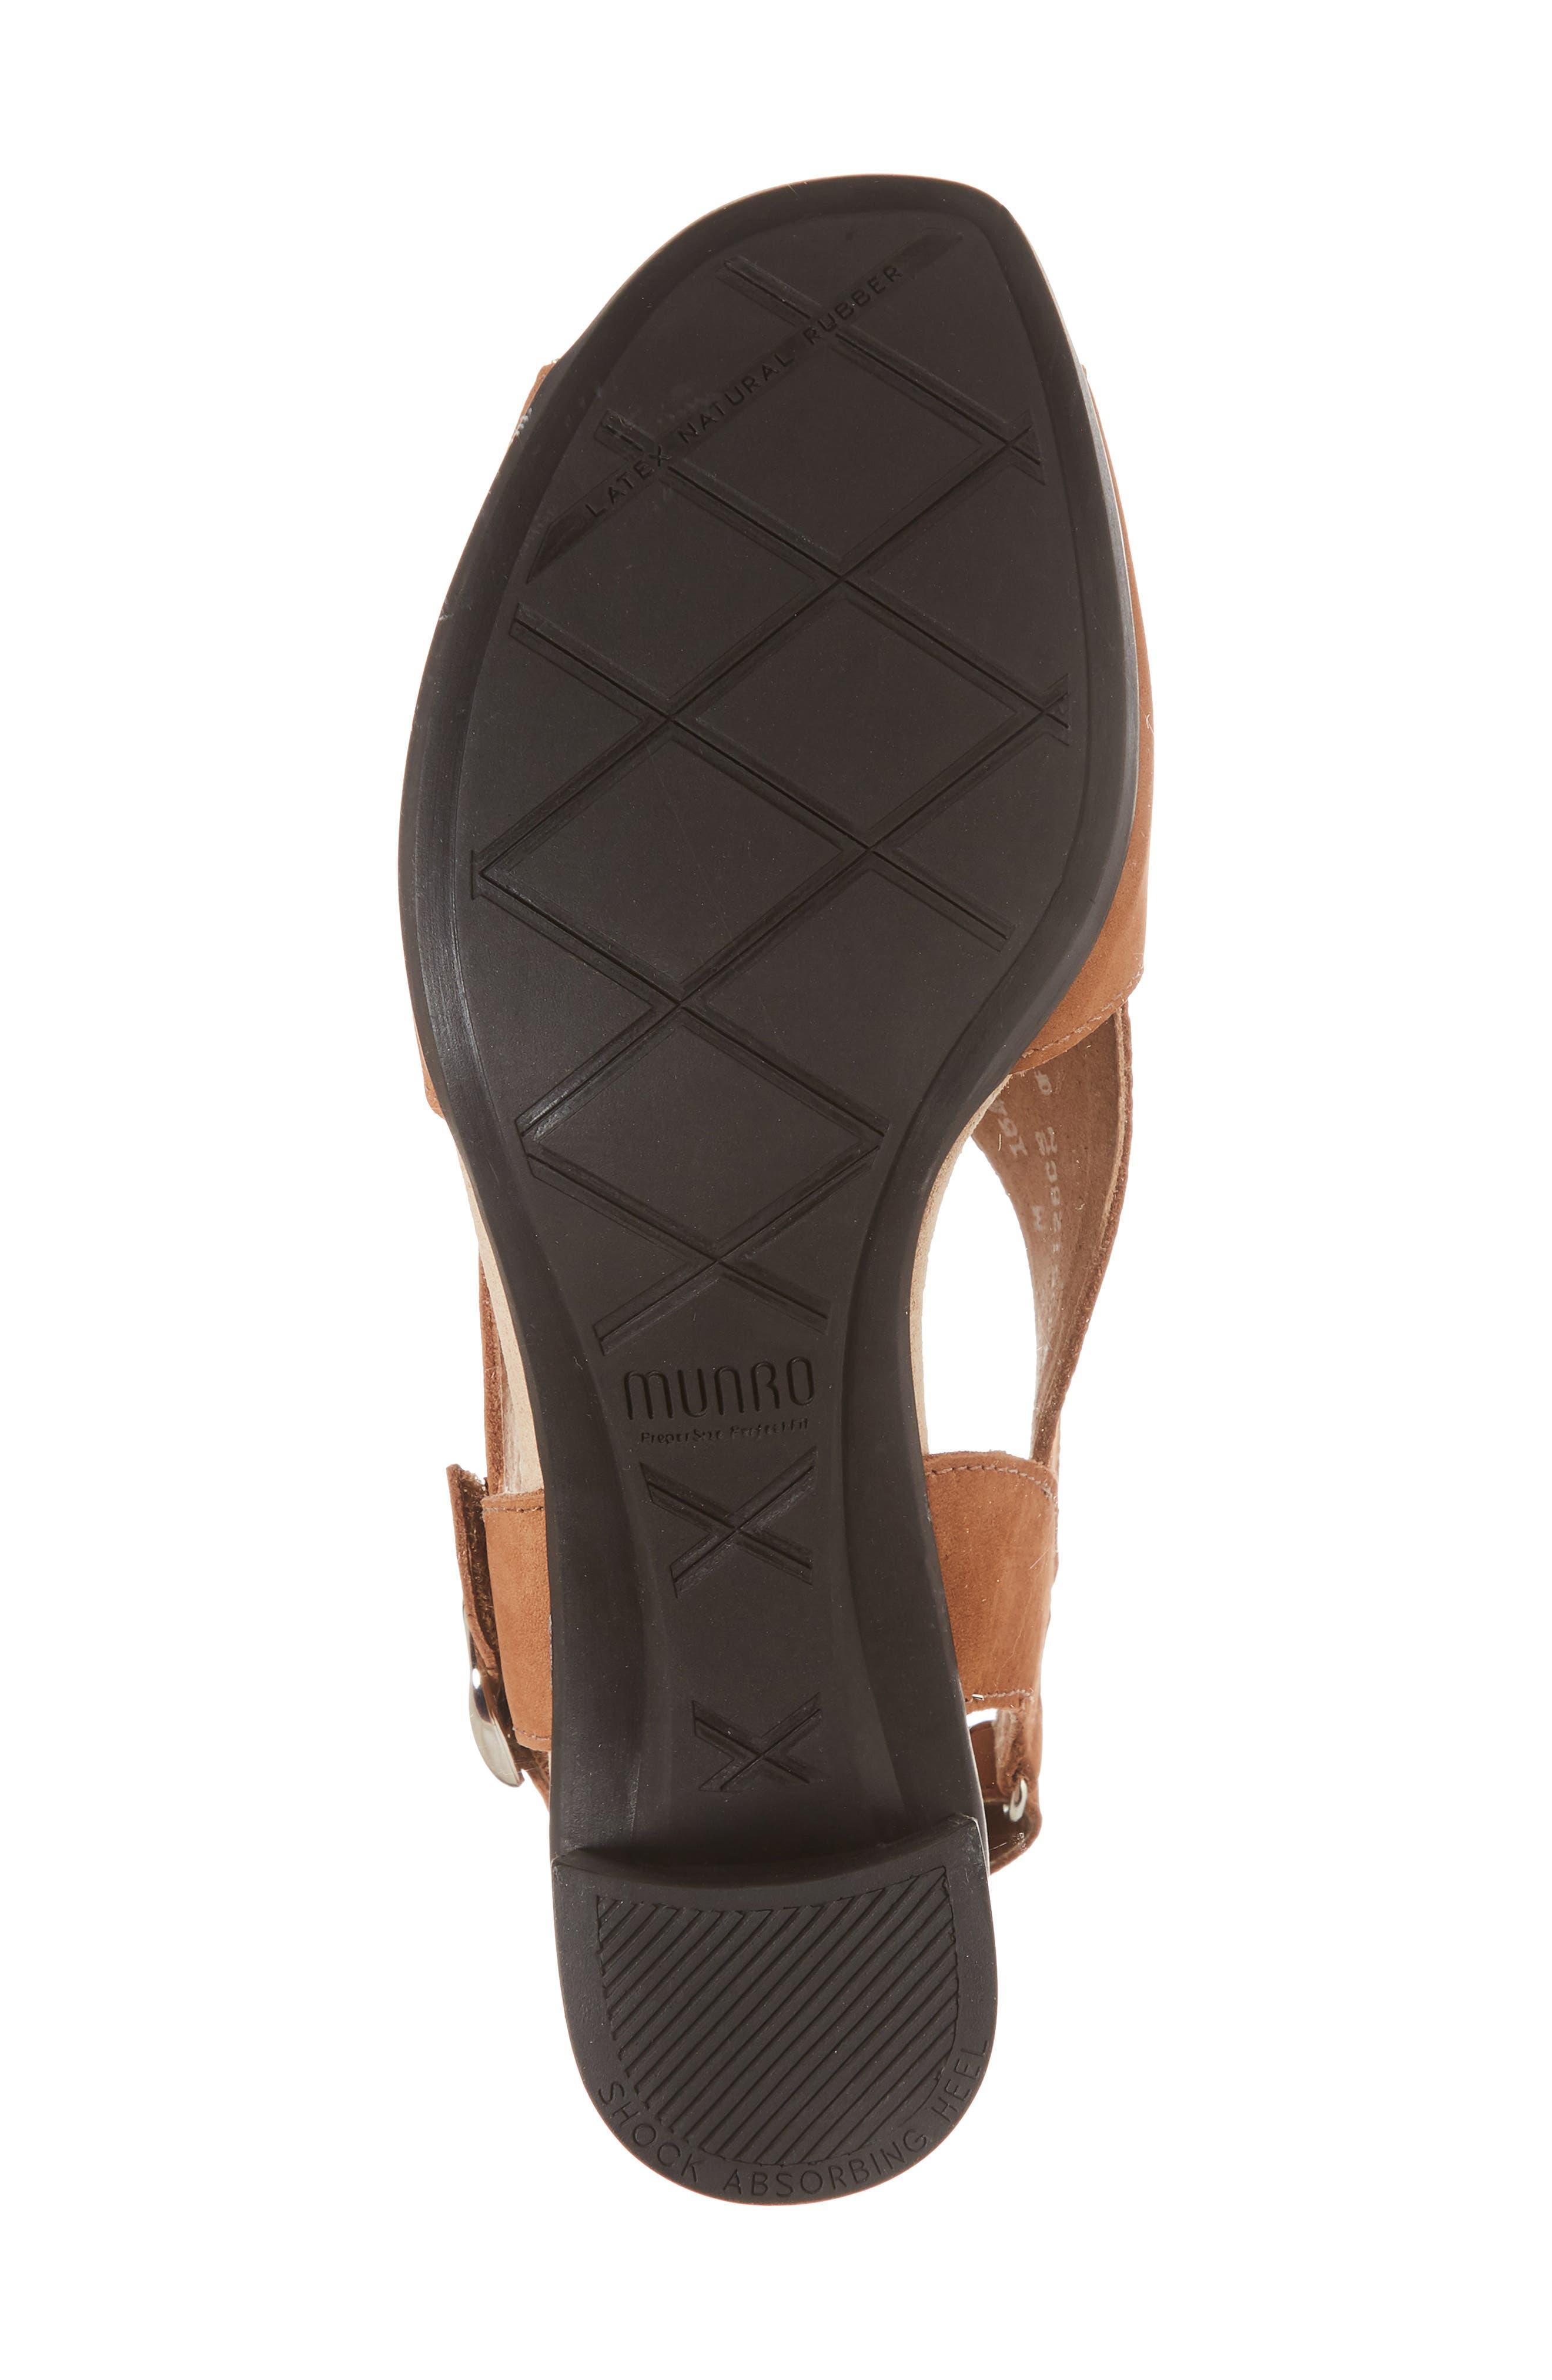 Laine Block Heel Sandal,                             Alternate thumbnail 6, color,                             Brown Nubuck Leather